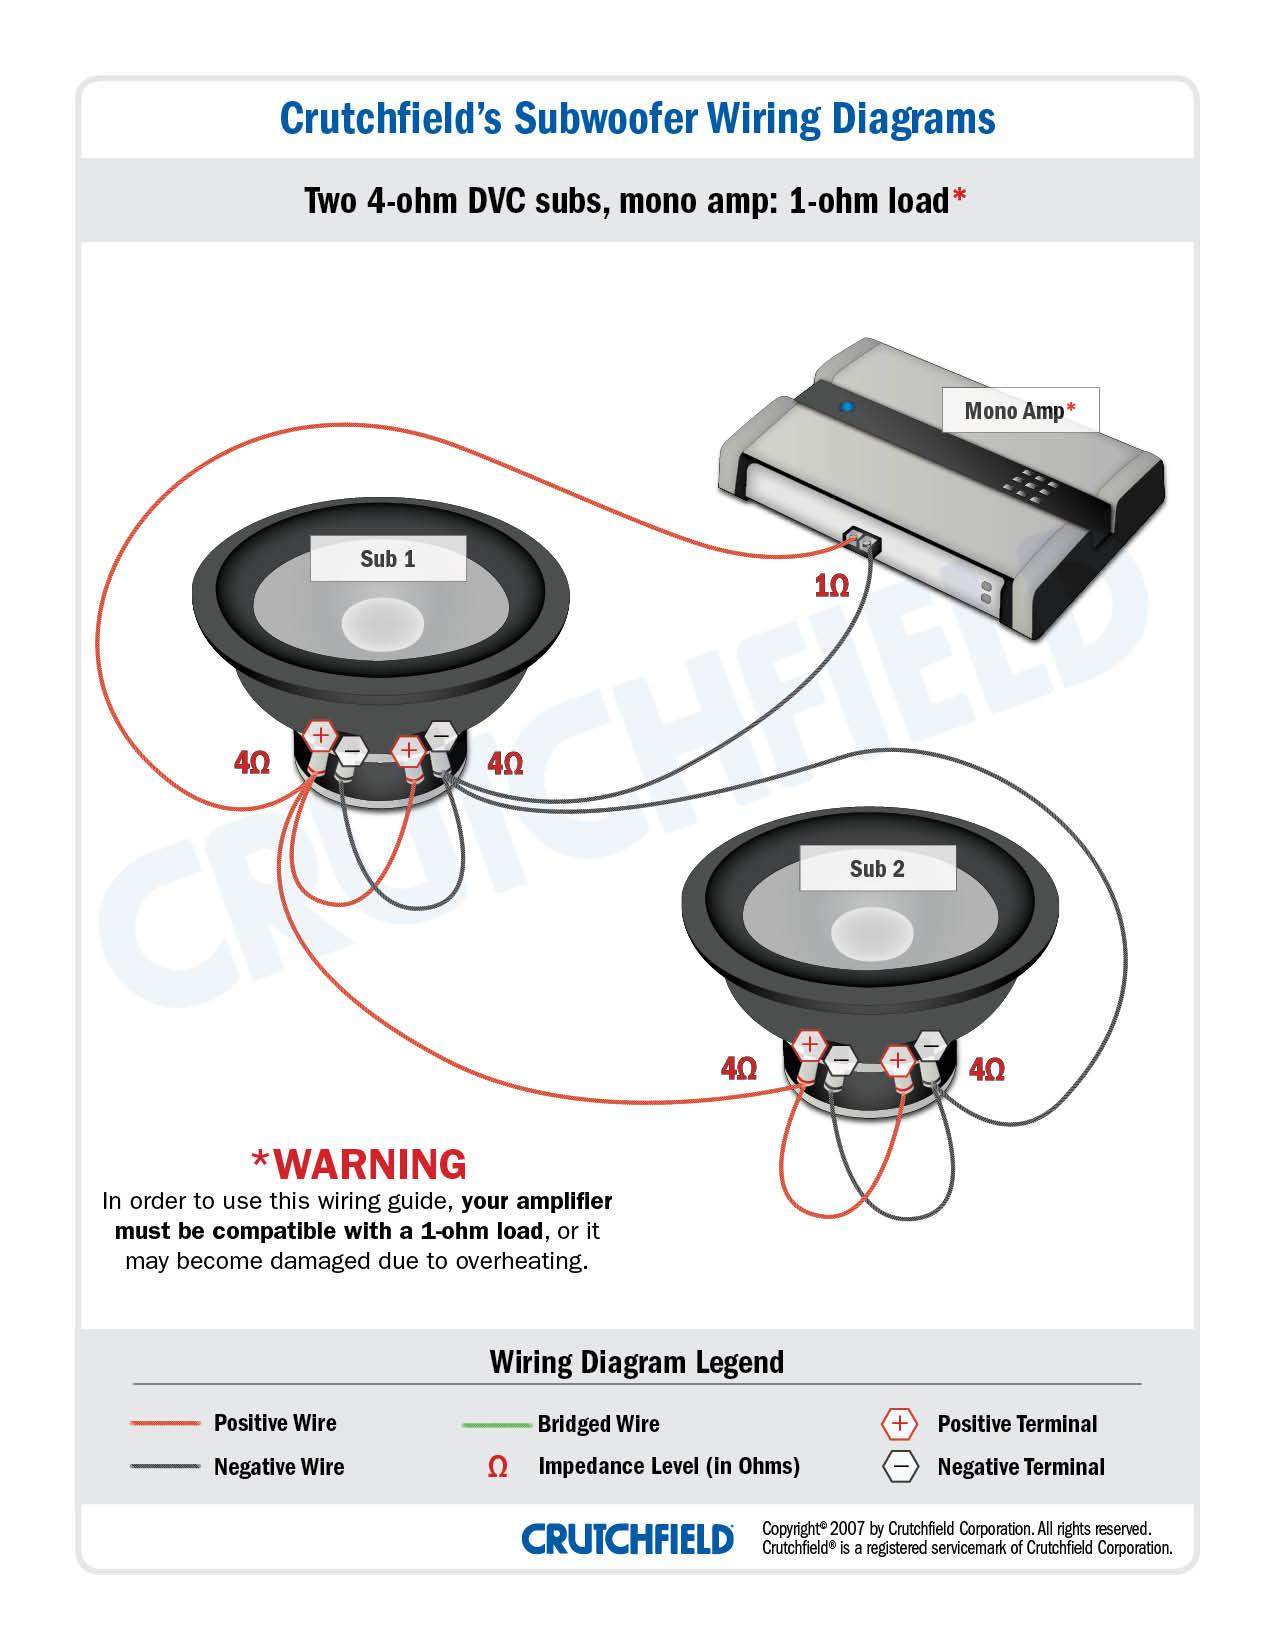 4 Ohm Dvc Wiring Diagram - Wiring Diagram Data Oreo - Subwoofer Wiring Diagram Dual 4 Ohm